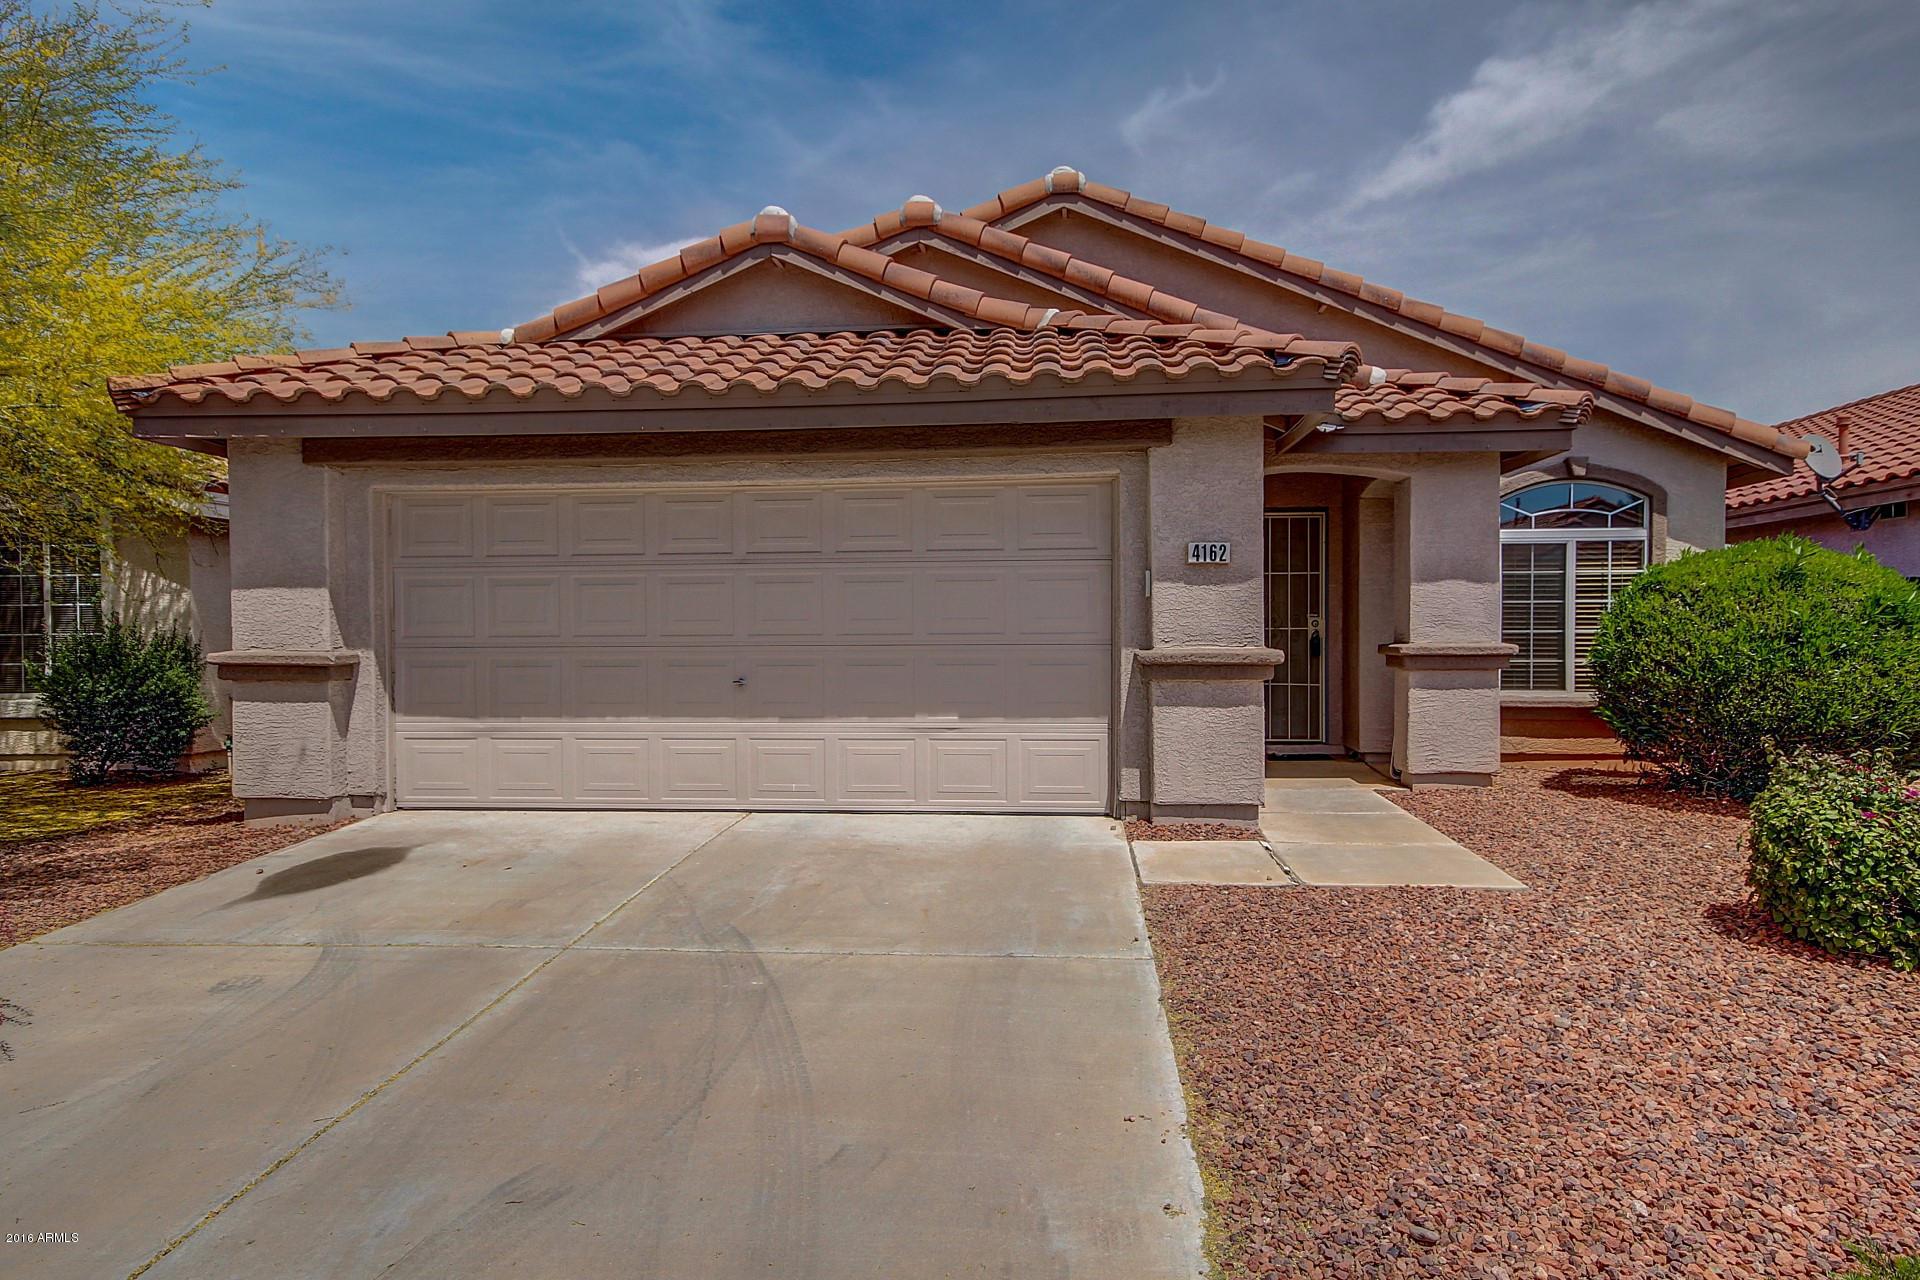 4162 W Bloomfield  Road  Phoenix AZ 85029